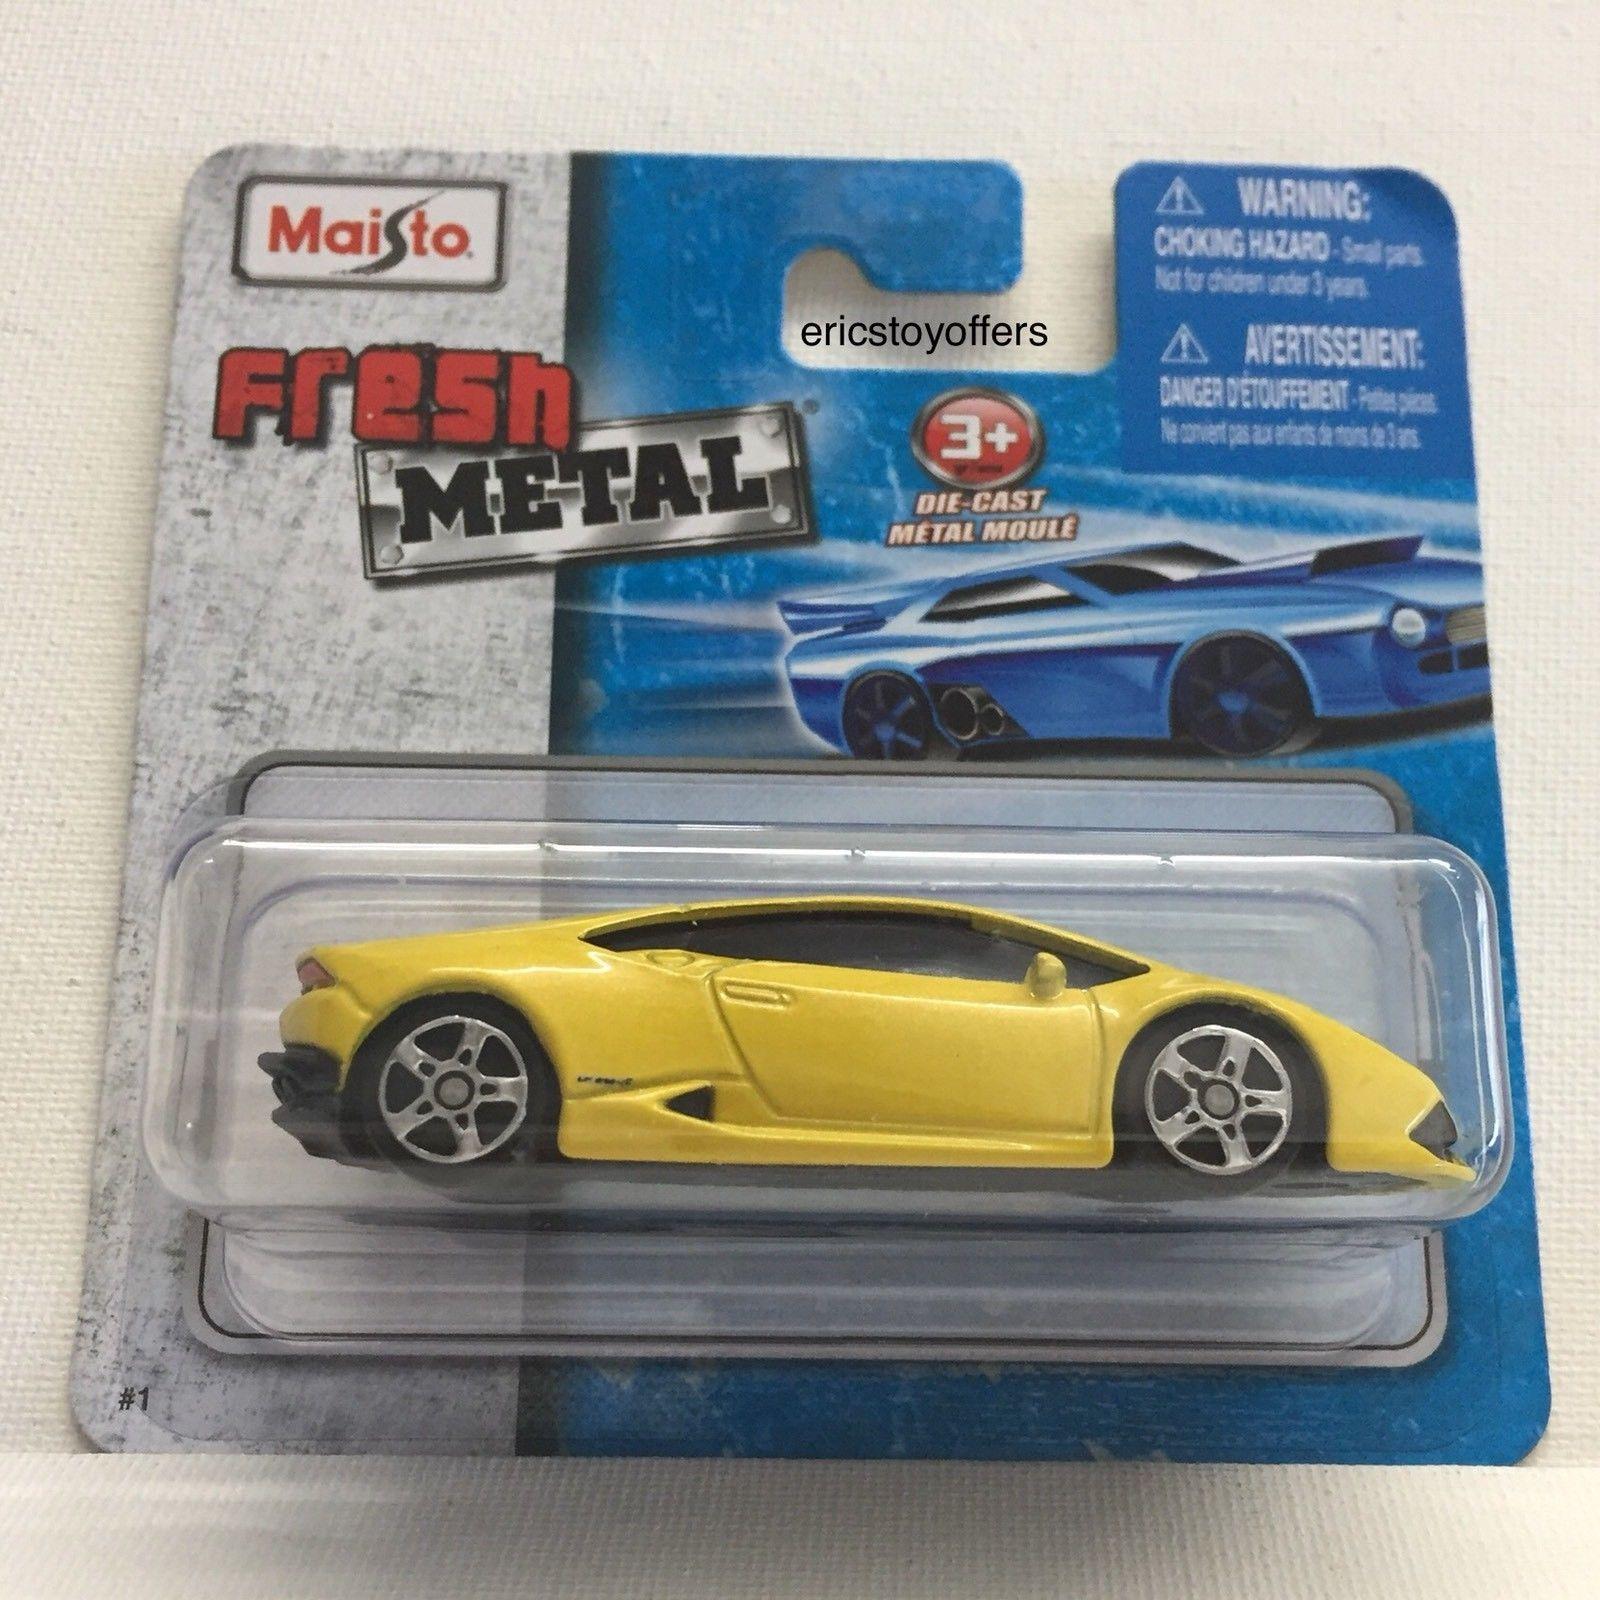 7f5f38a91c30a5b80a12162a12b56bd5 Marvelous Lamborghini Huracan Hack asphalt 8 Cars Trend